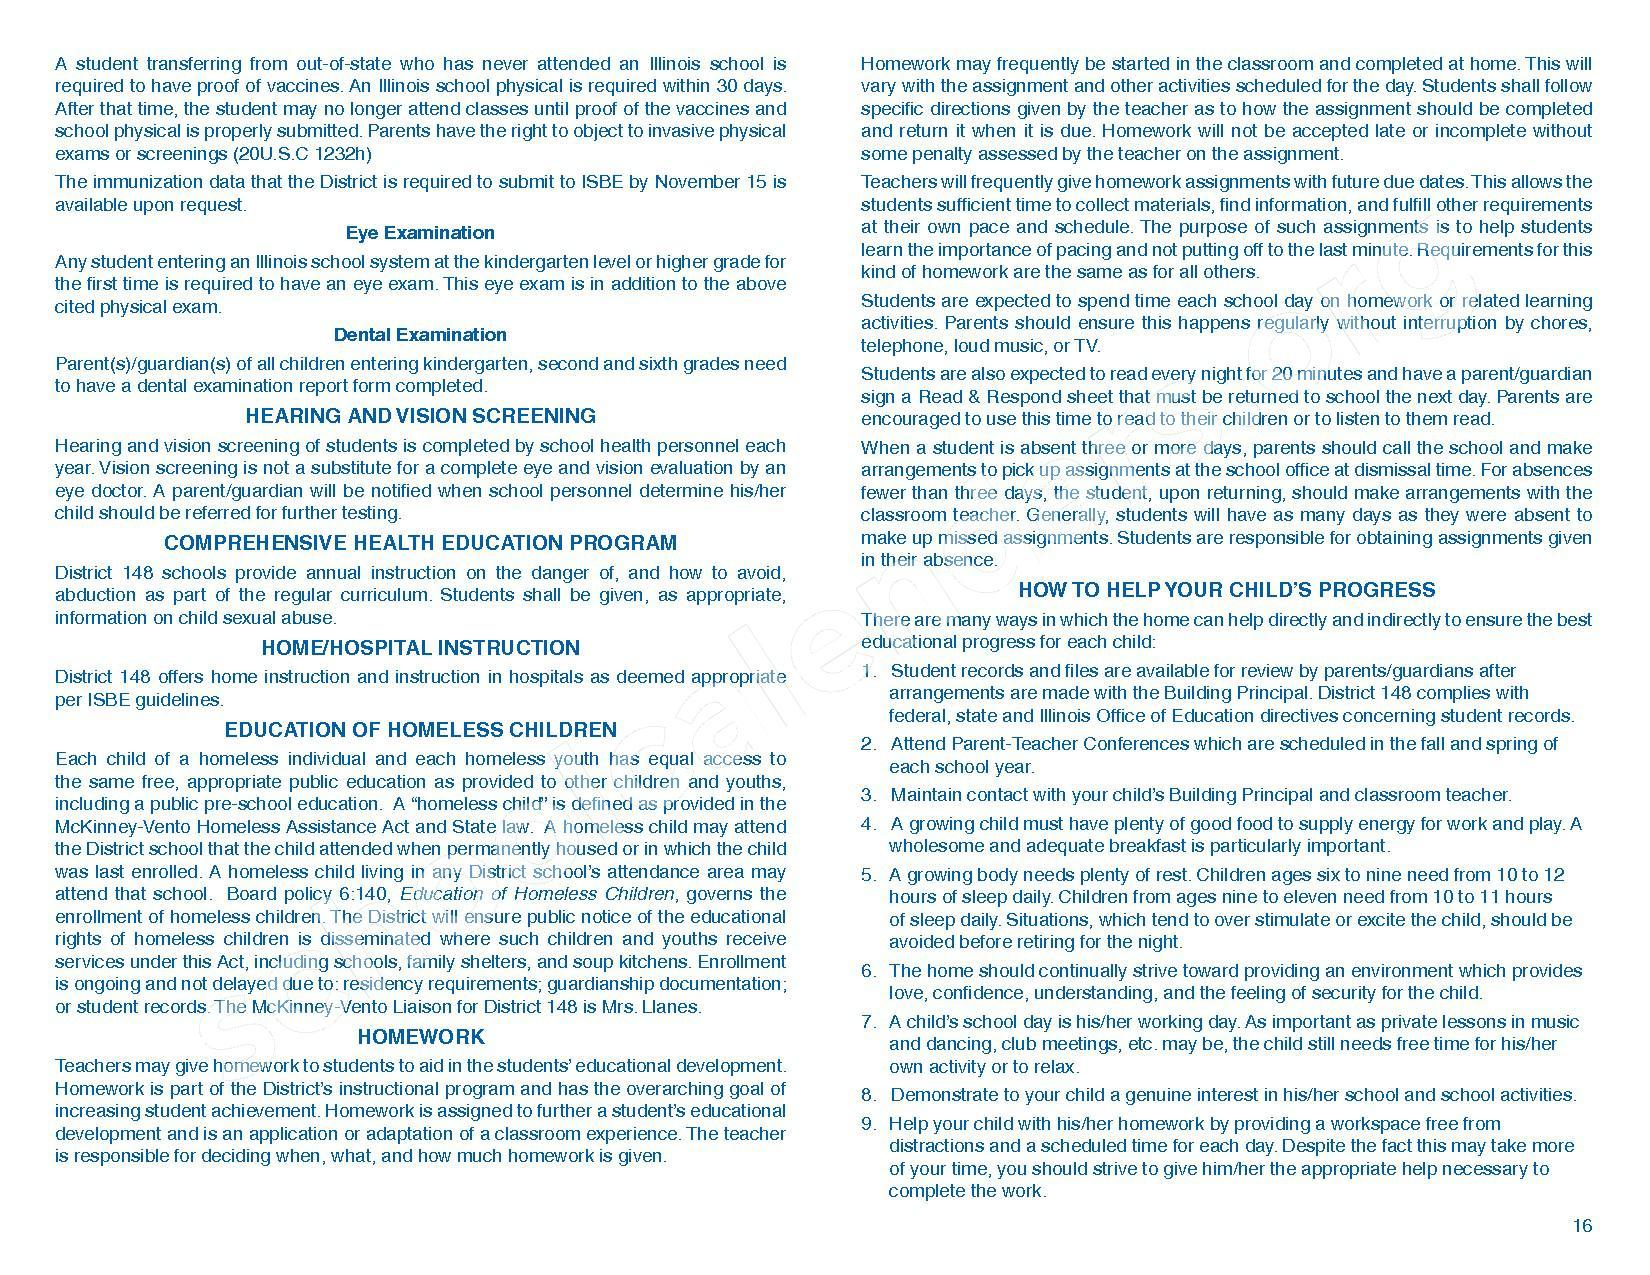 2016 - 2017 Parent/Student Handbook – Roosevelt Elementary School – page 20